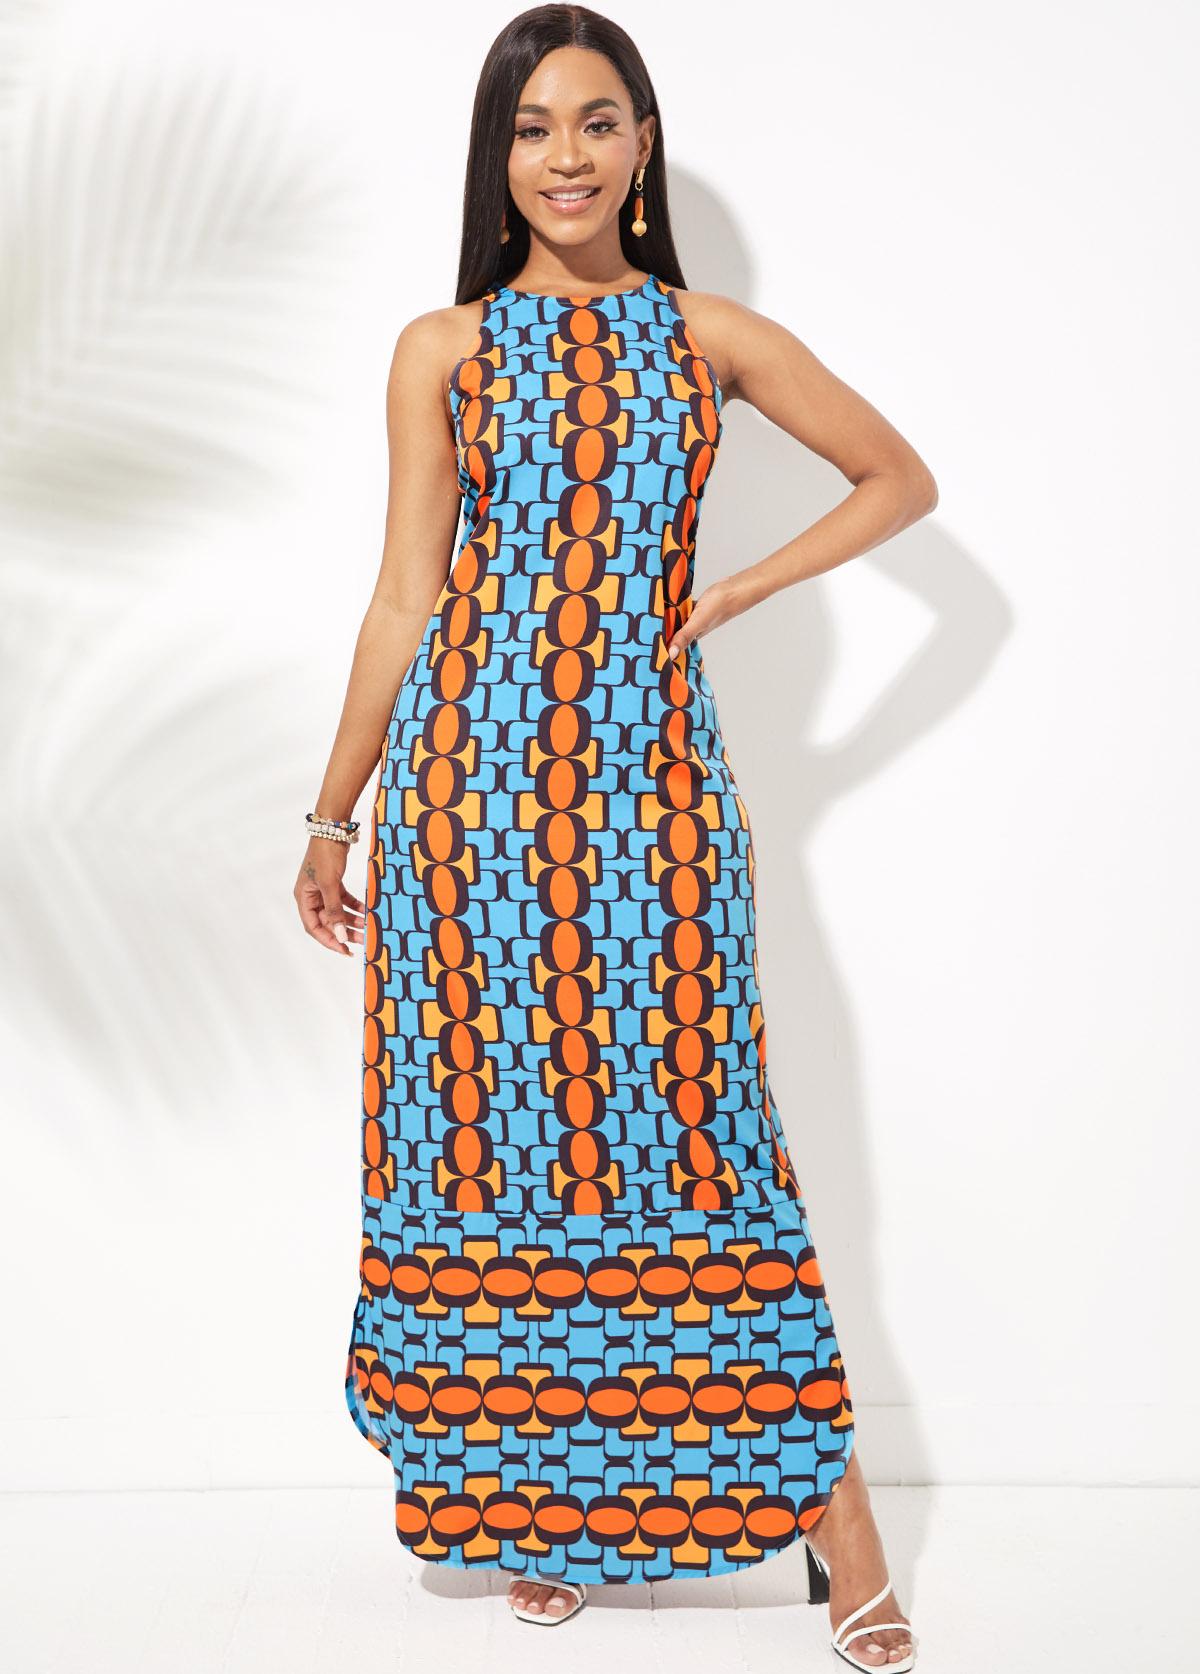 Geometric Print Round Neck Side Slit Dress